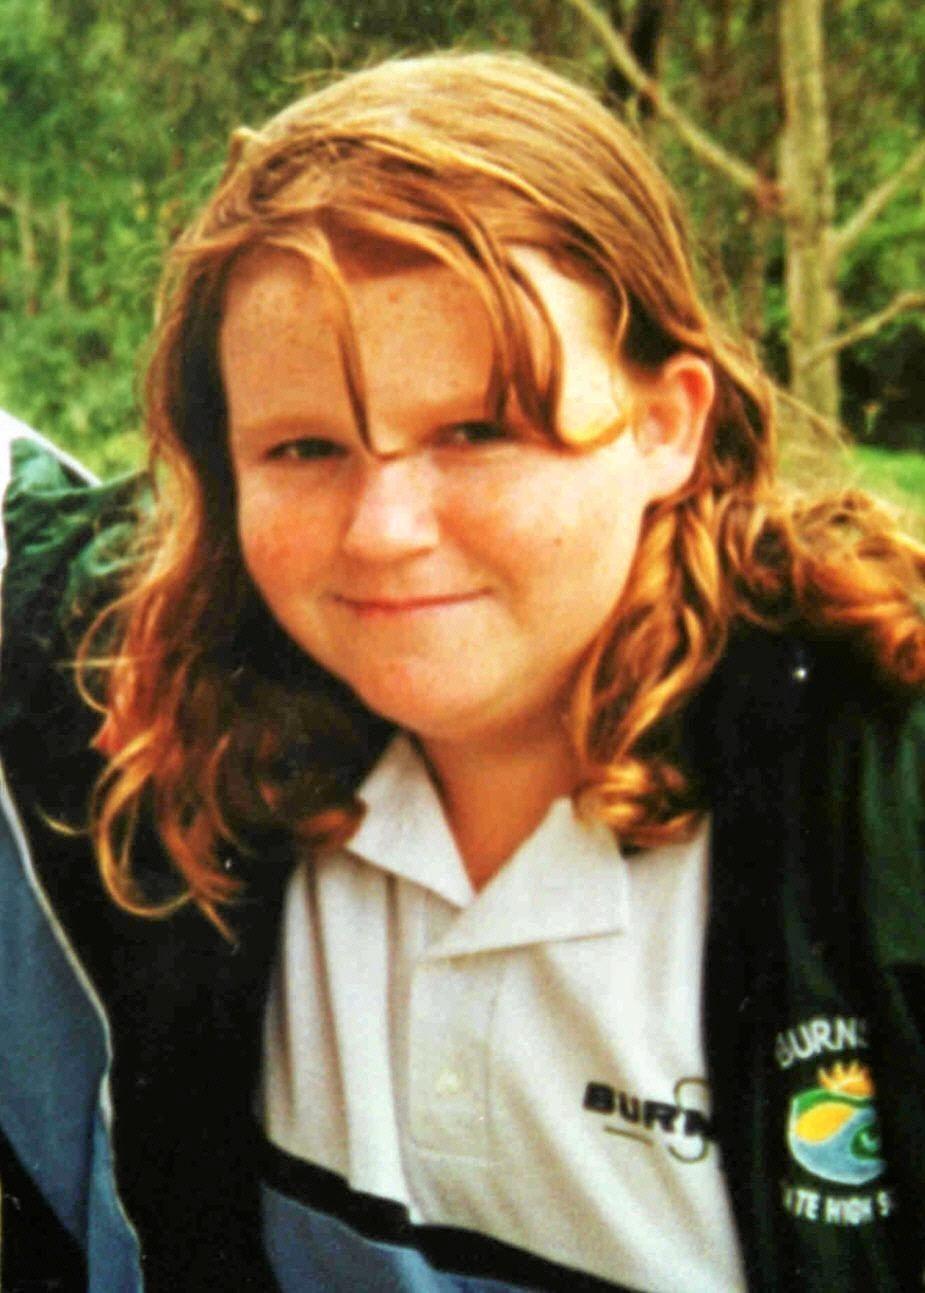 Teenager Jessica Gaudie, 16. in a Burnside High school photo.